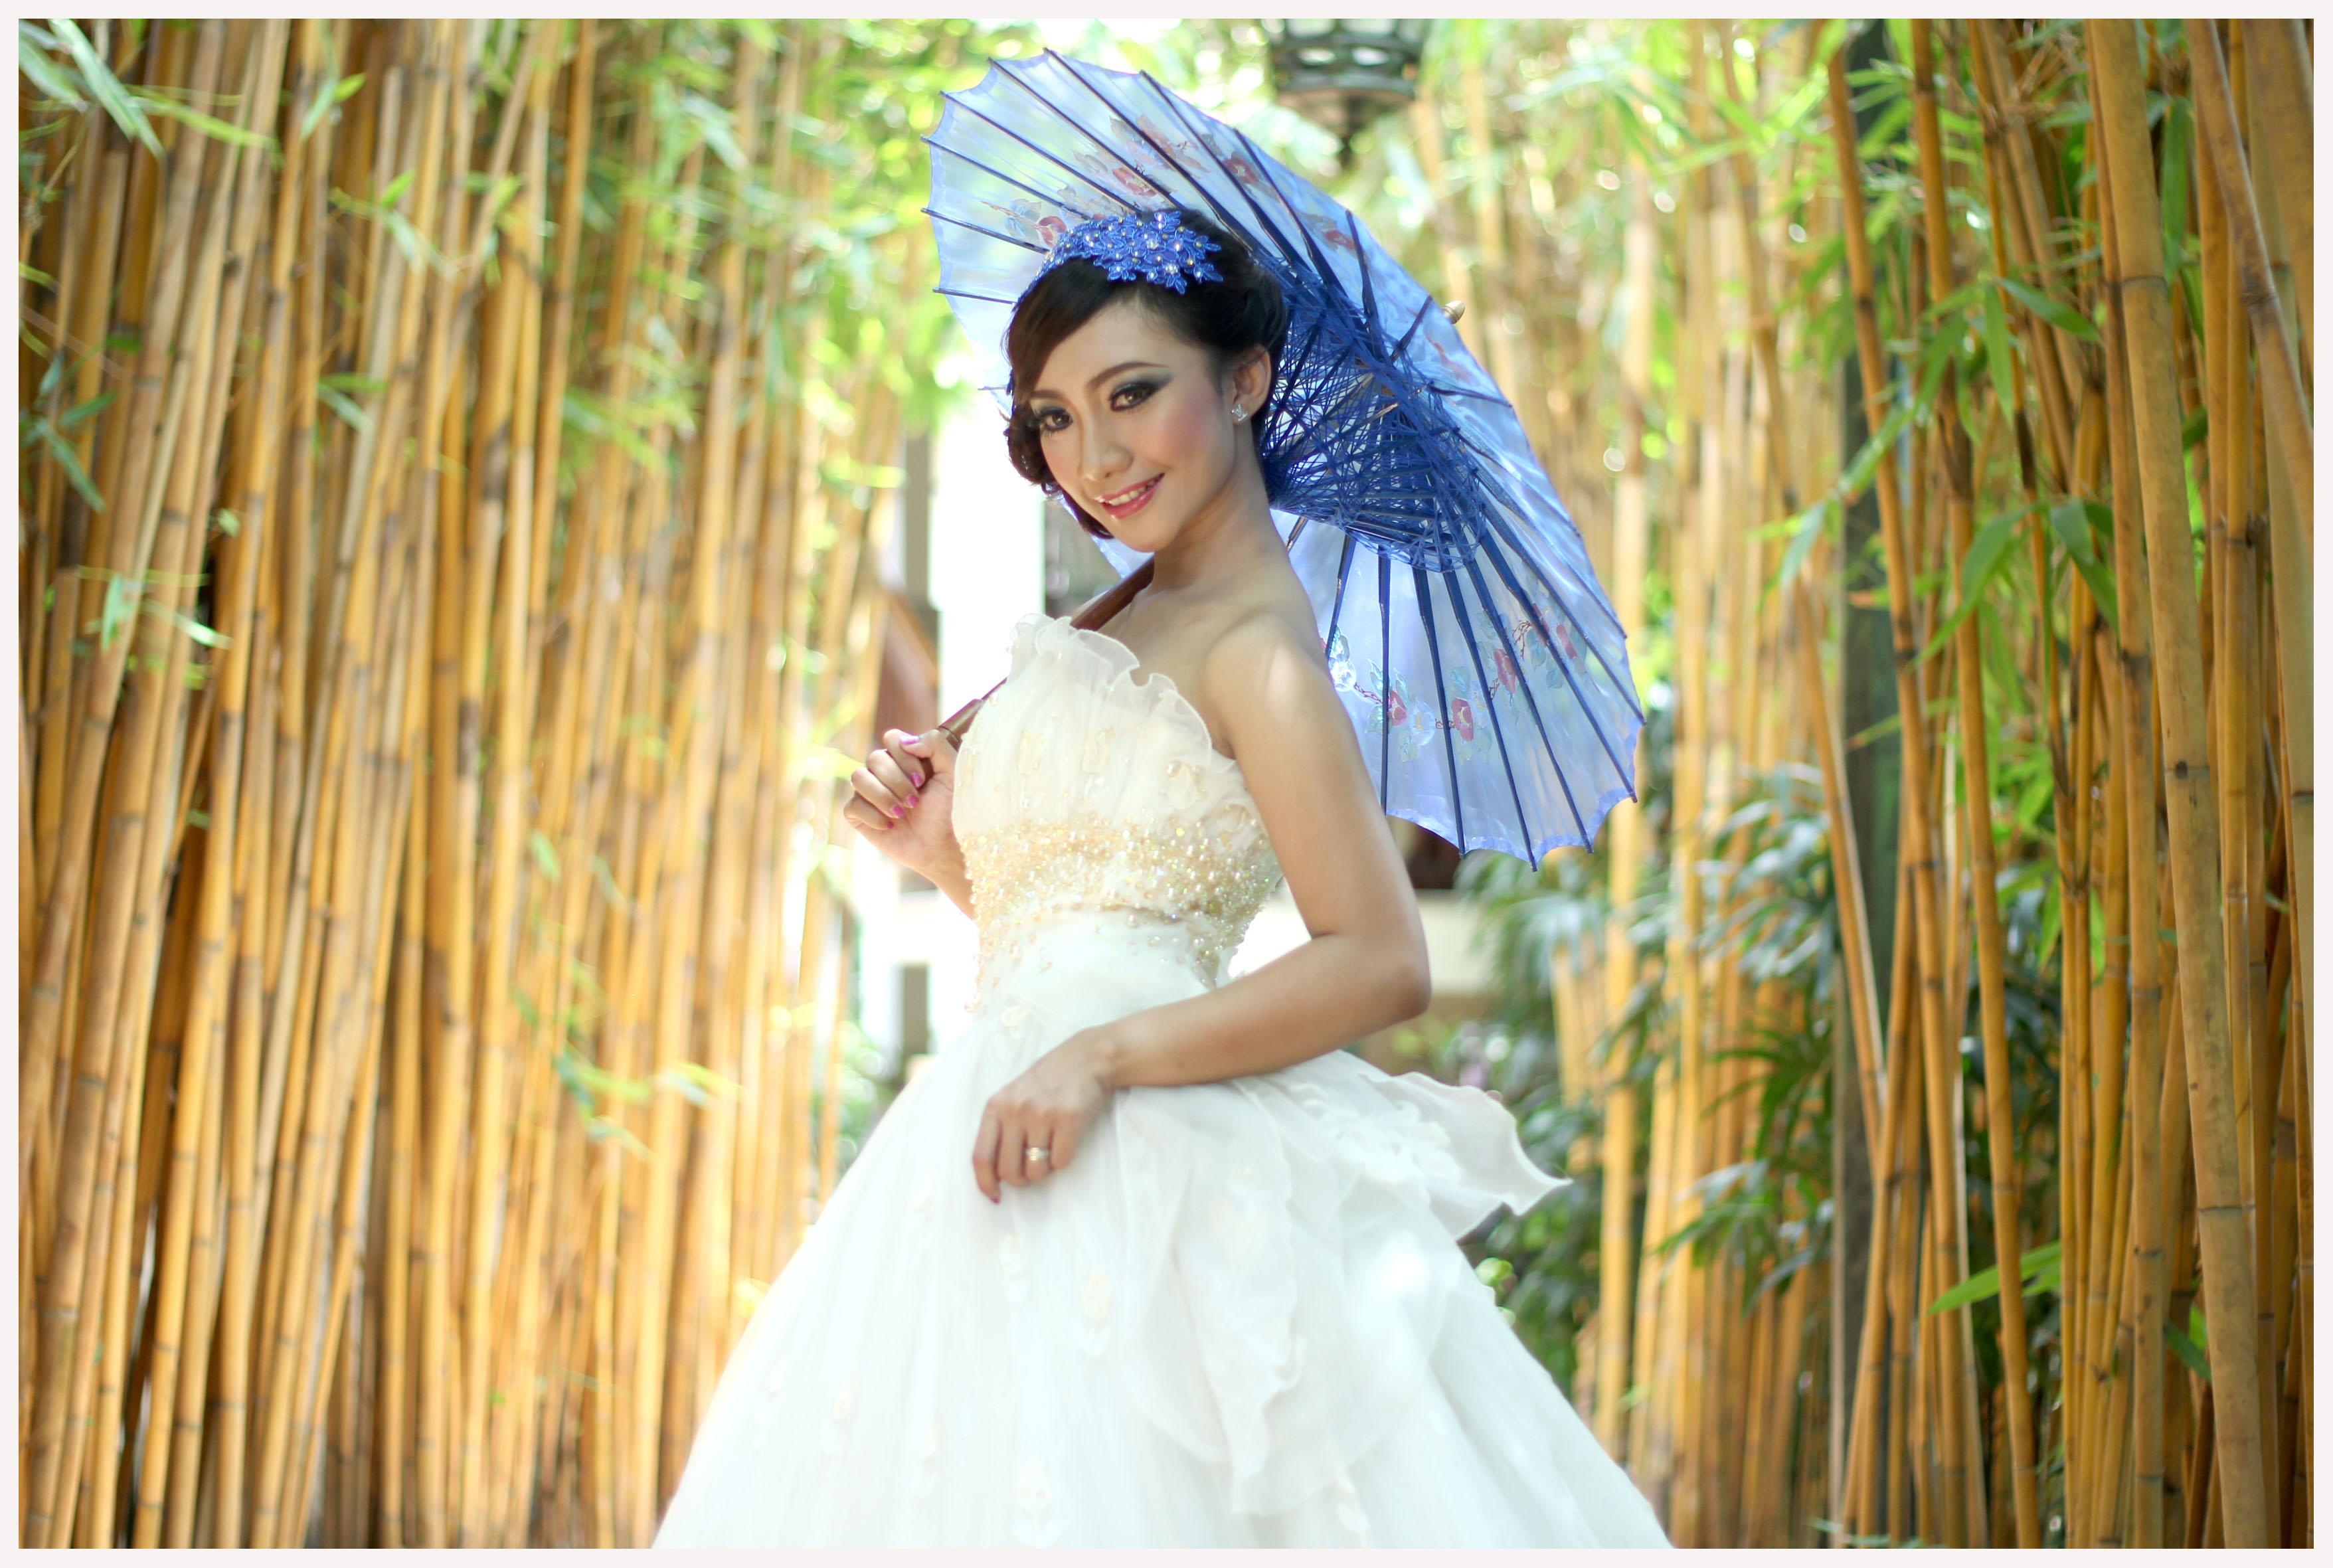 081355406363 Foto Prewedding Foto Pernikahan Foto Kebaya Wisuda